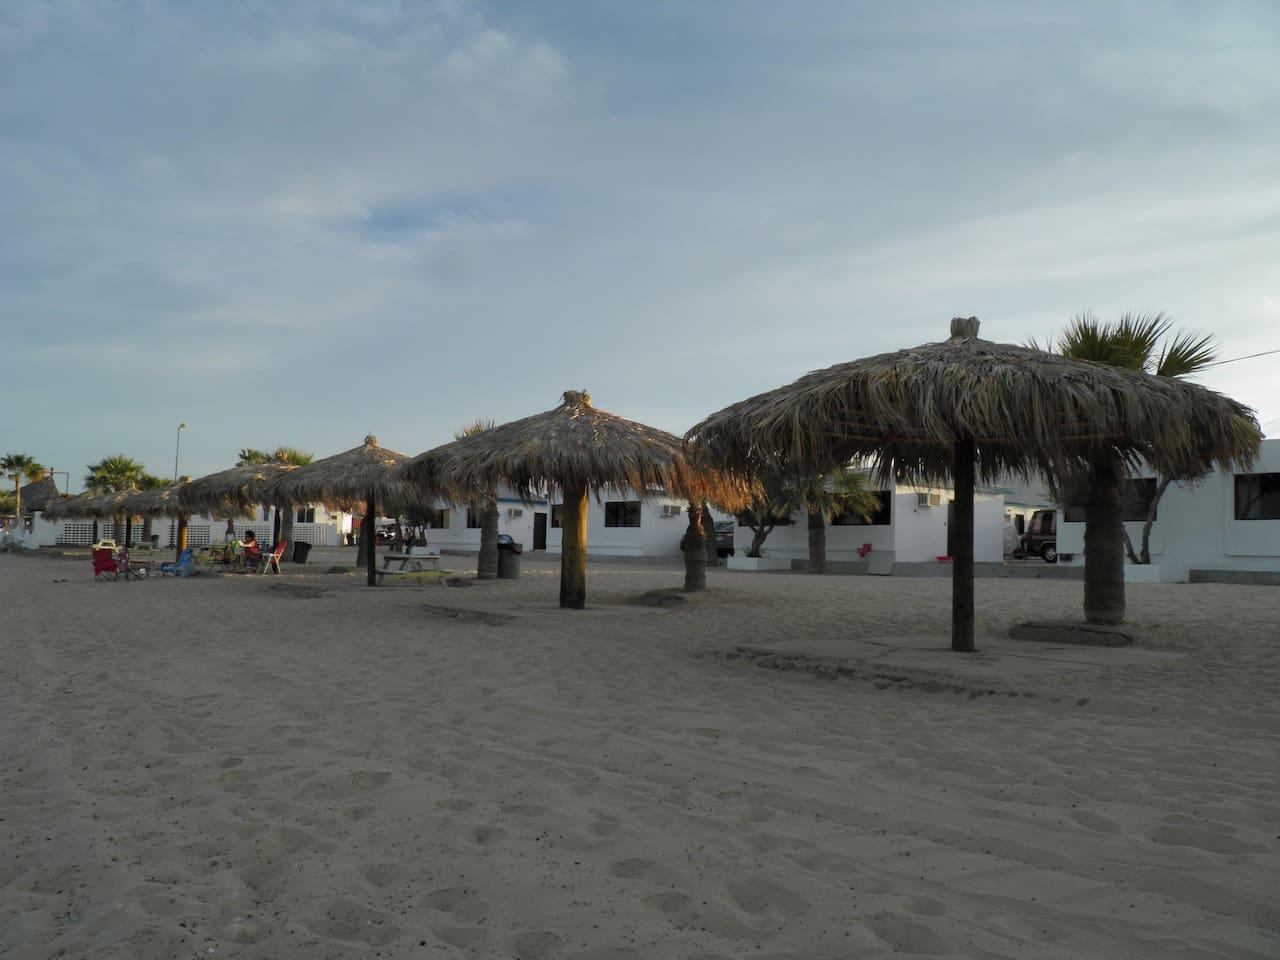 Bungalow frente al Mar #33 al #40 Seaside Hotel & Victors RV Park San Felipe Baja California